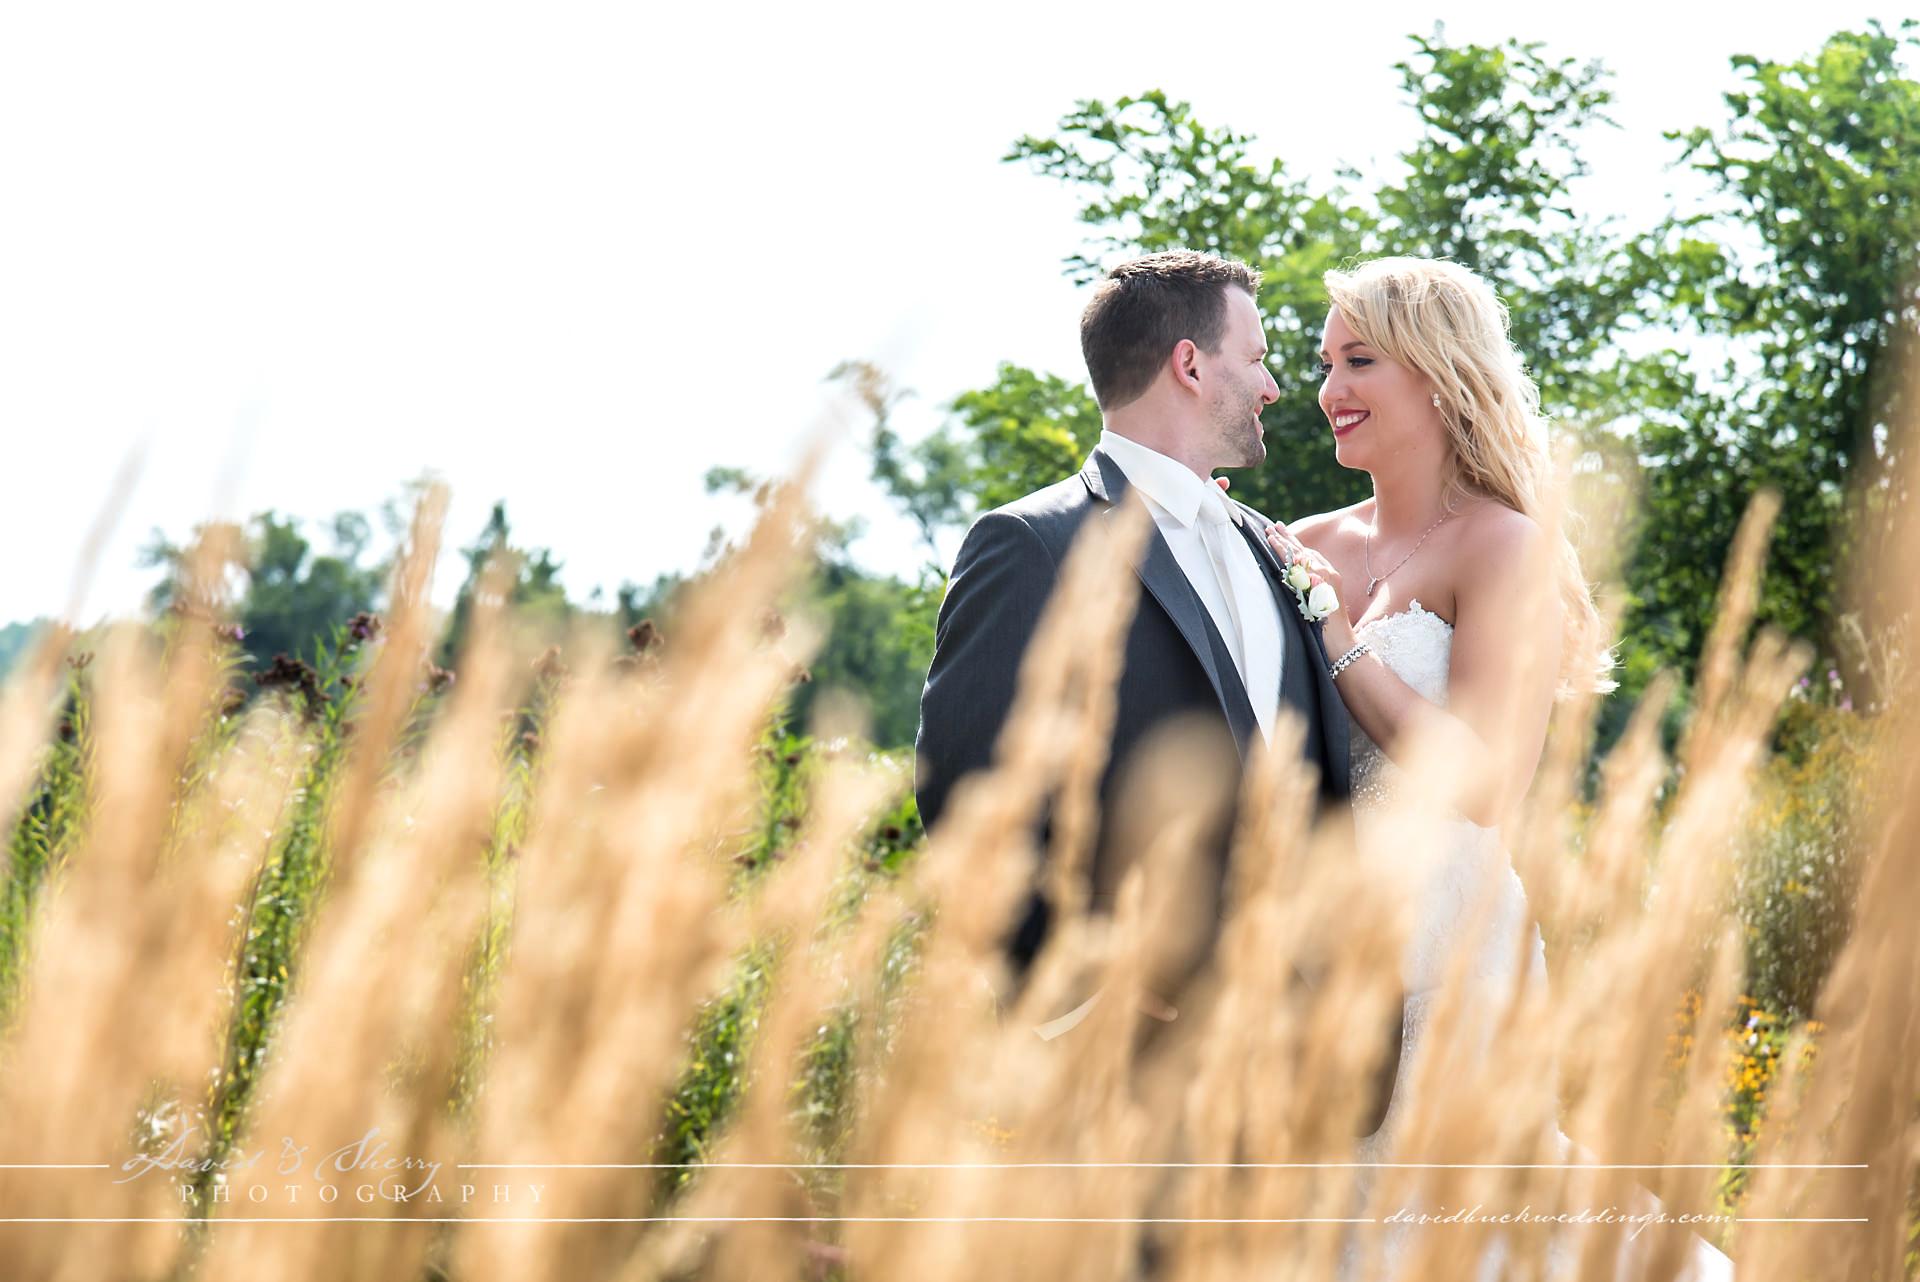 Cobble_Beach_Wedding_Photography_019